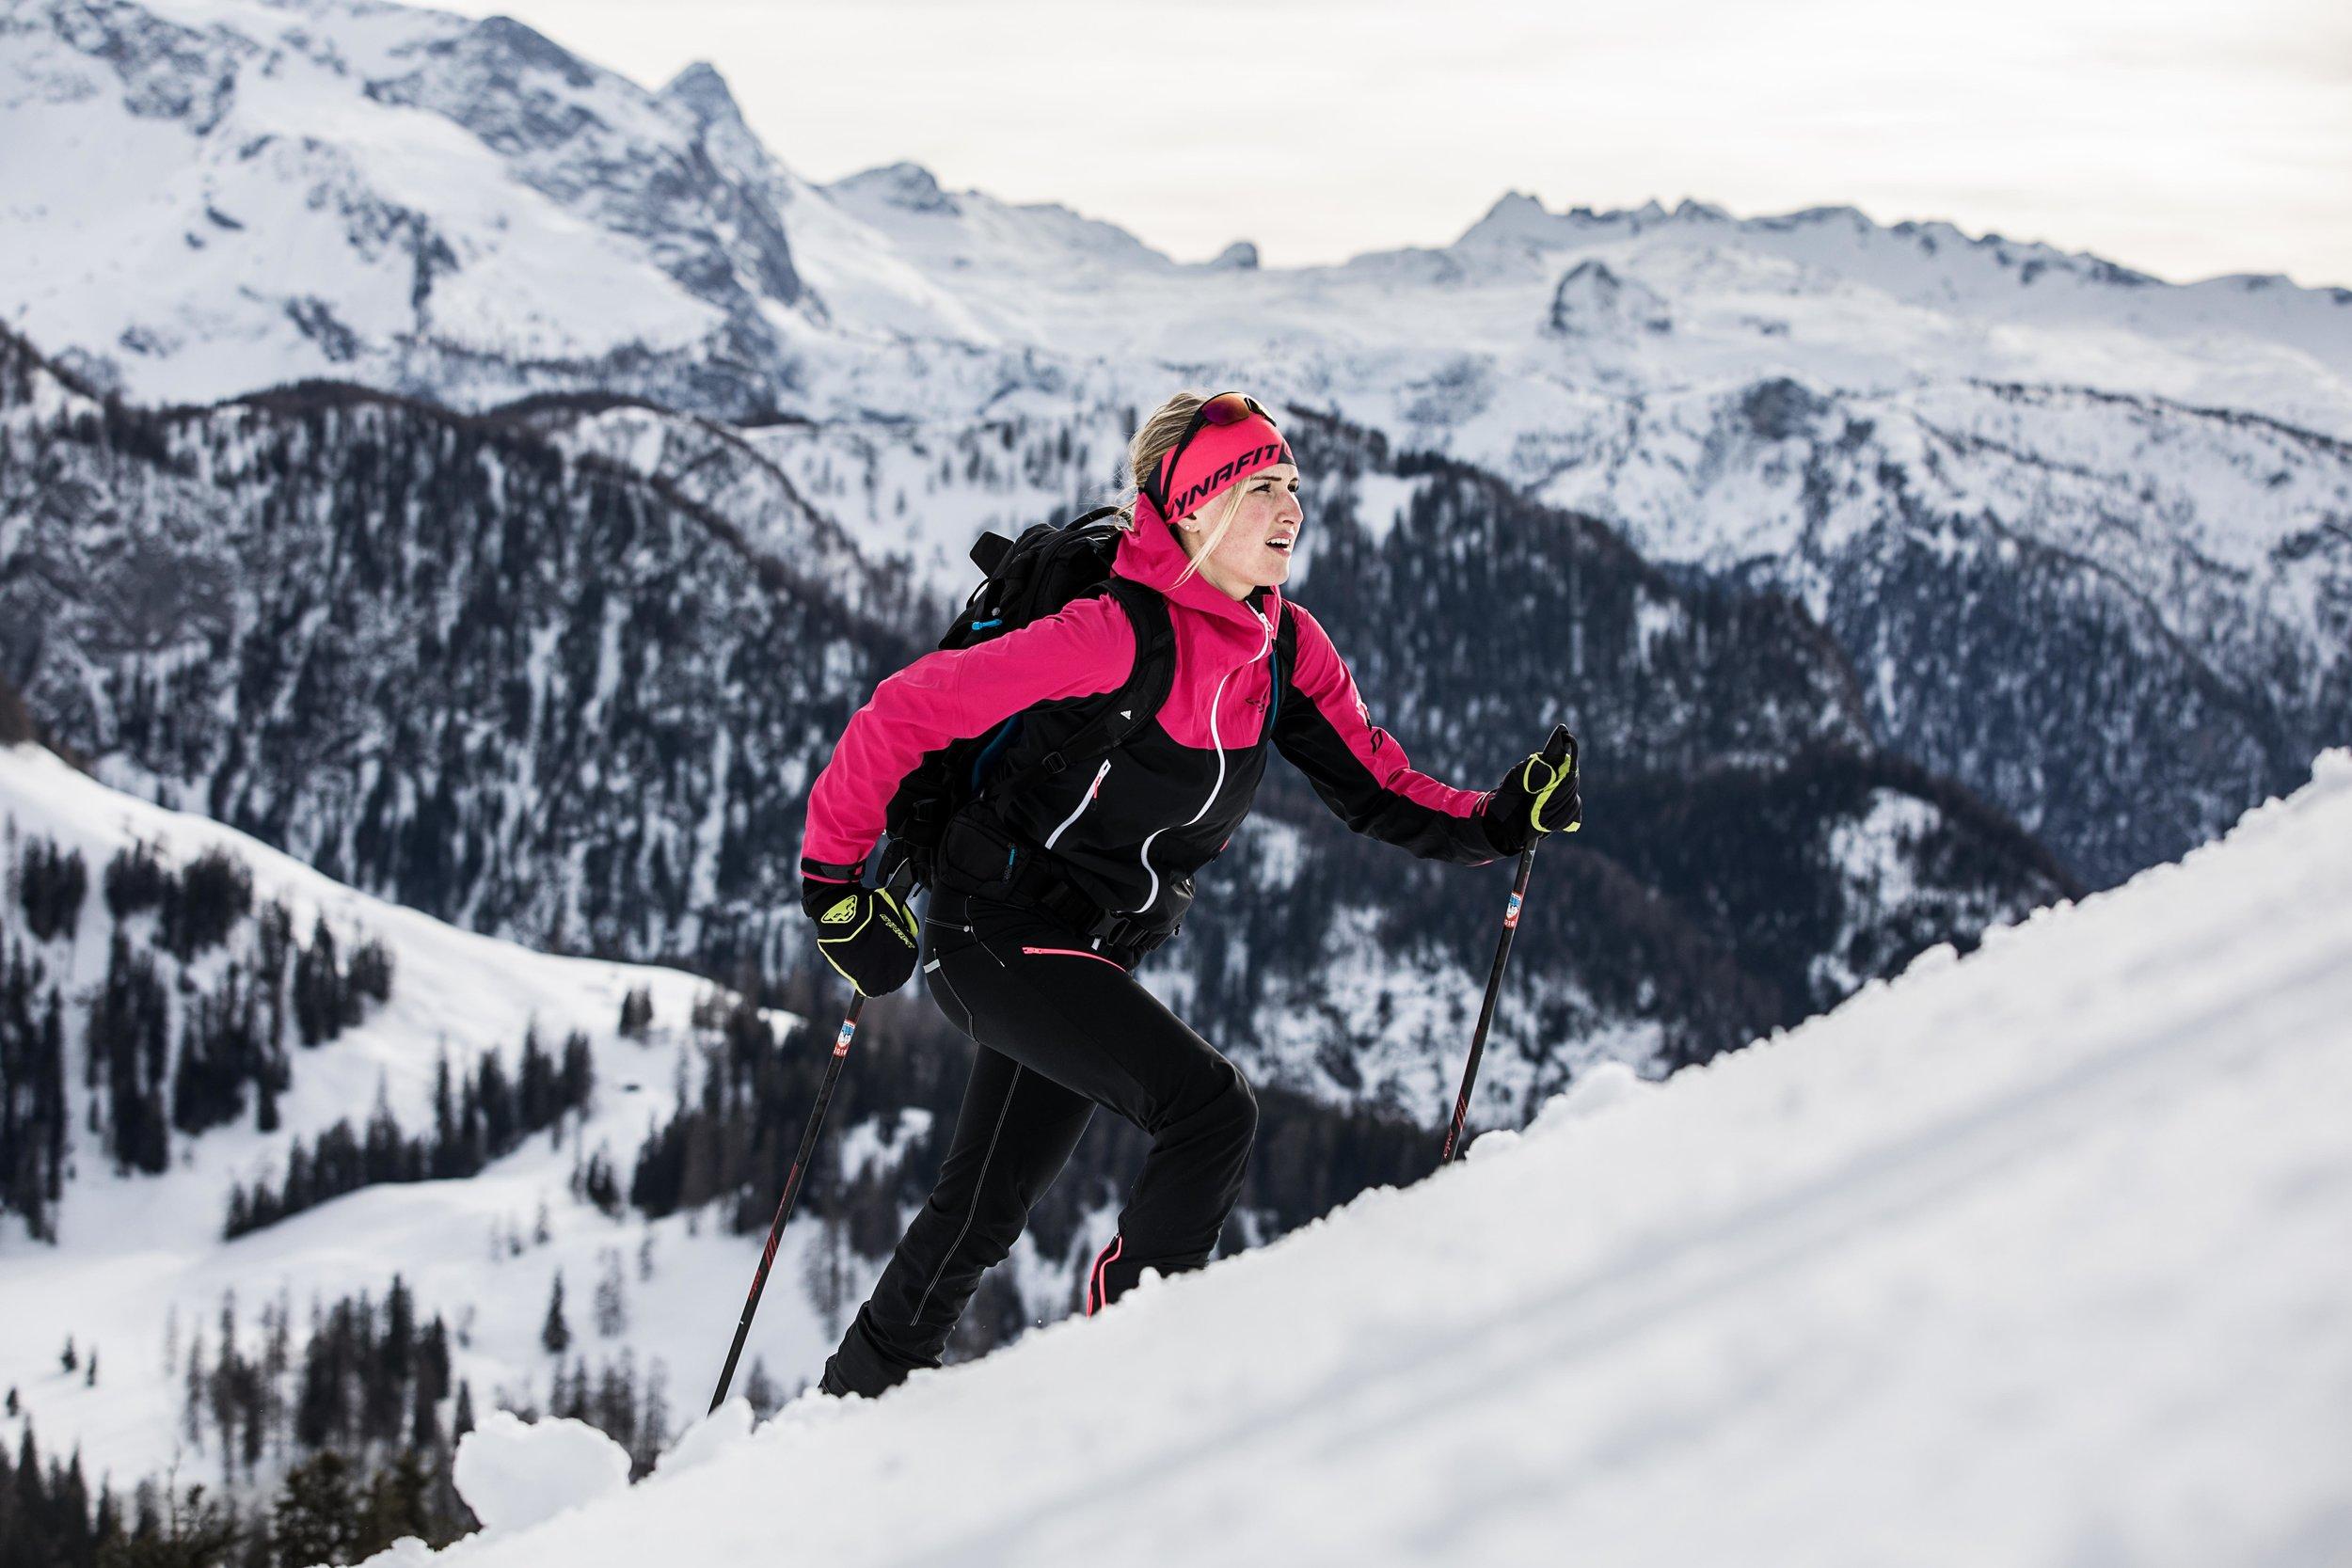 helgeroeske_Johanna_Erhart_Skitour.jpg